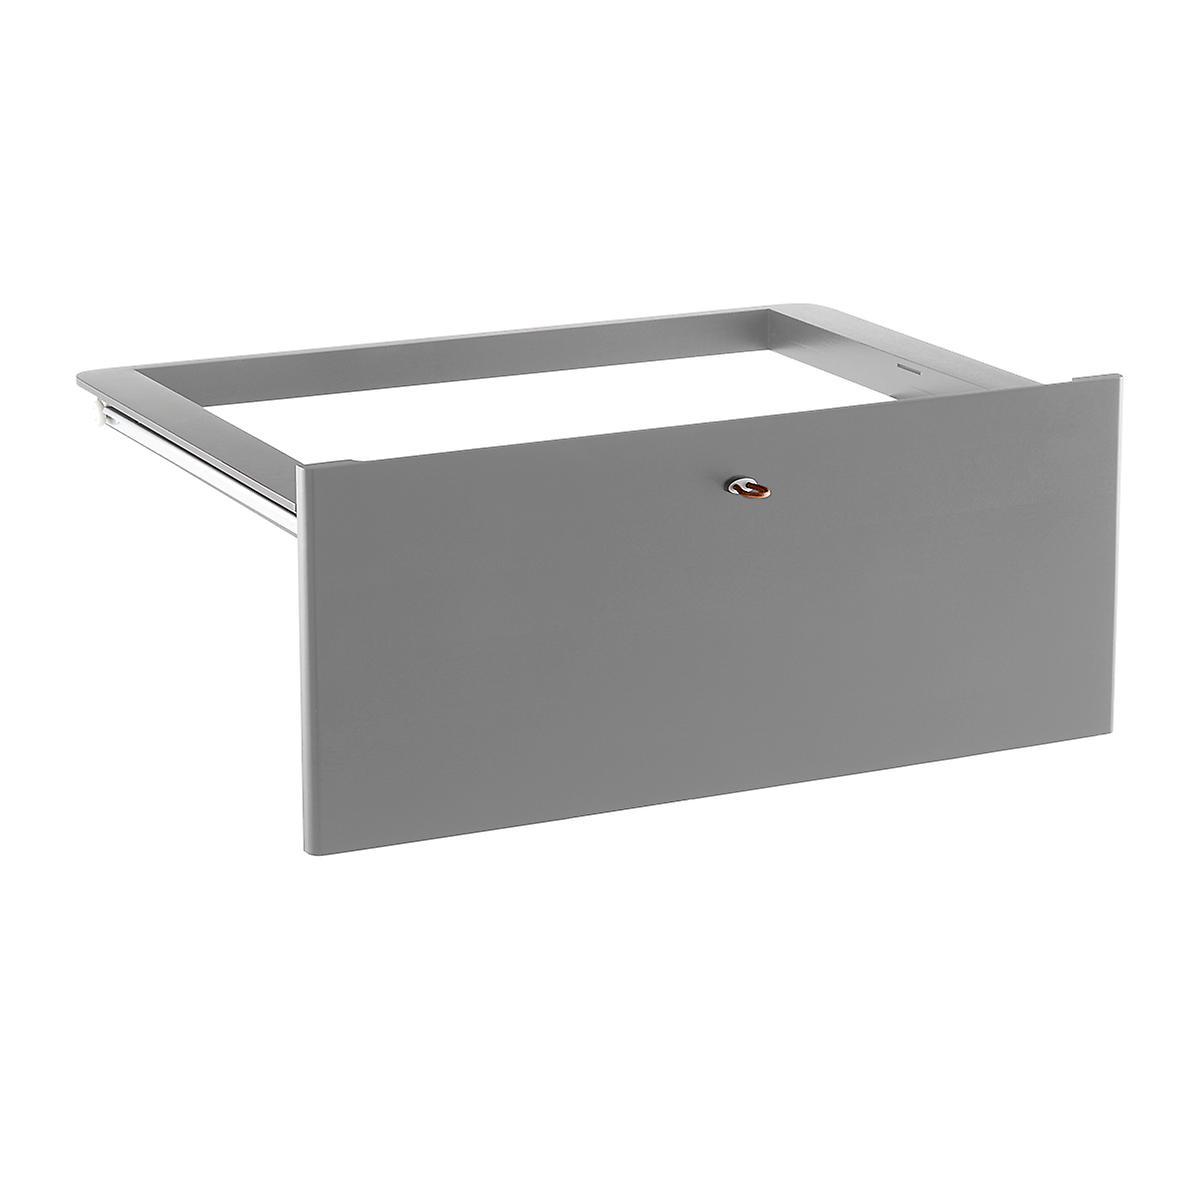 Grey Elfa Décor Drawer Frames & Fronts